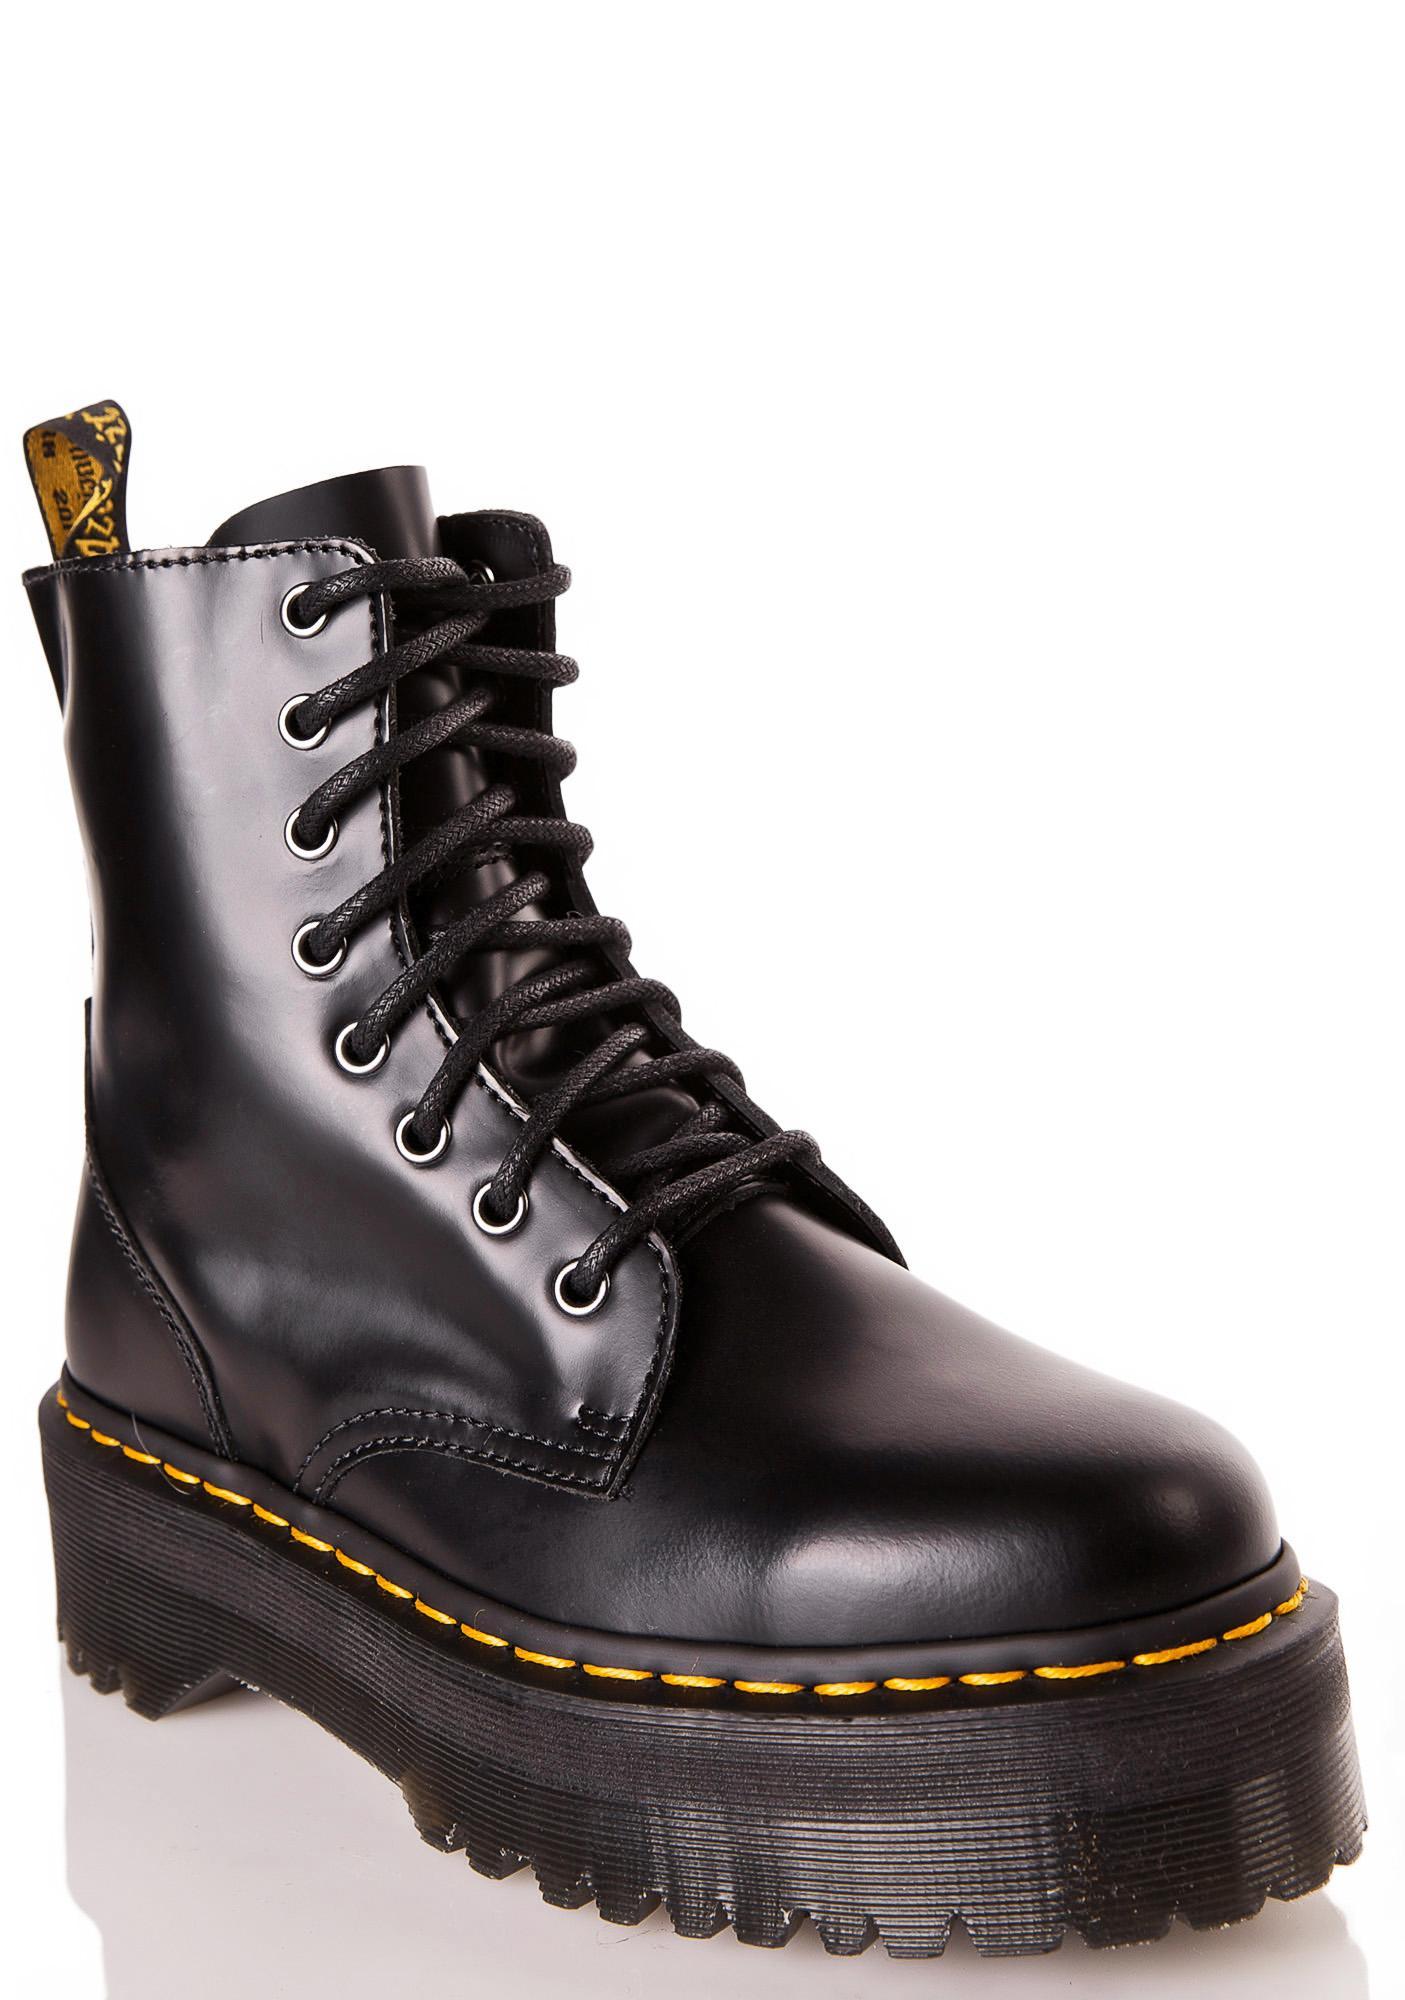 Dr Martens Jadon 8 Eye Boots Dolls Kill